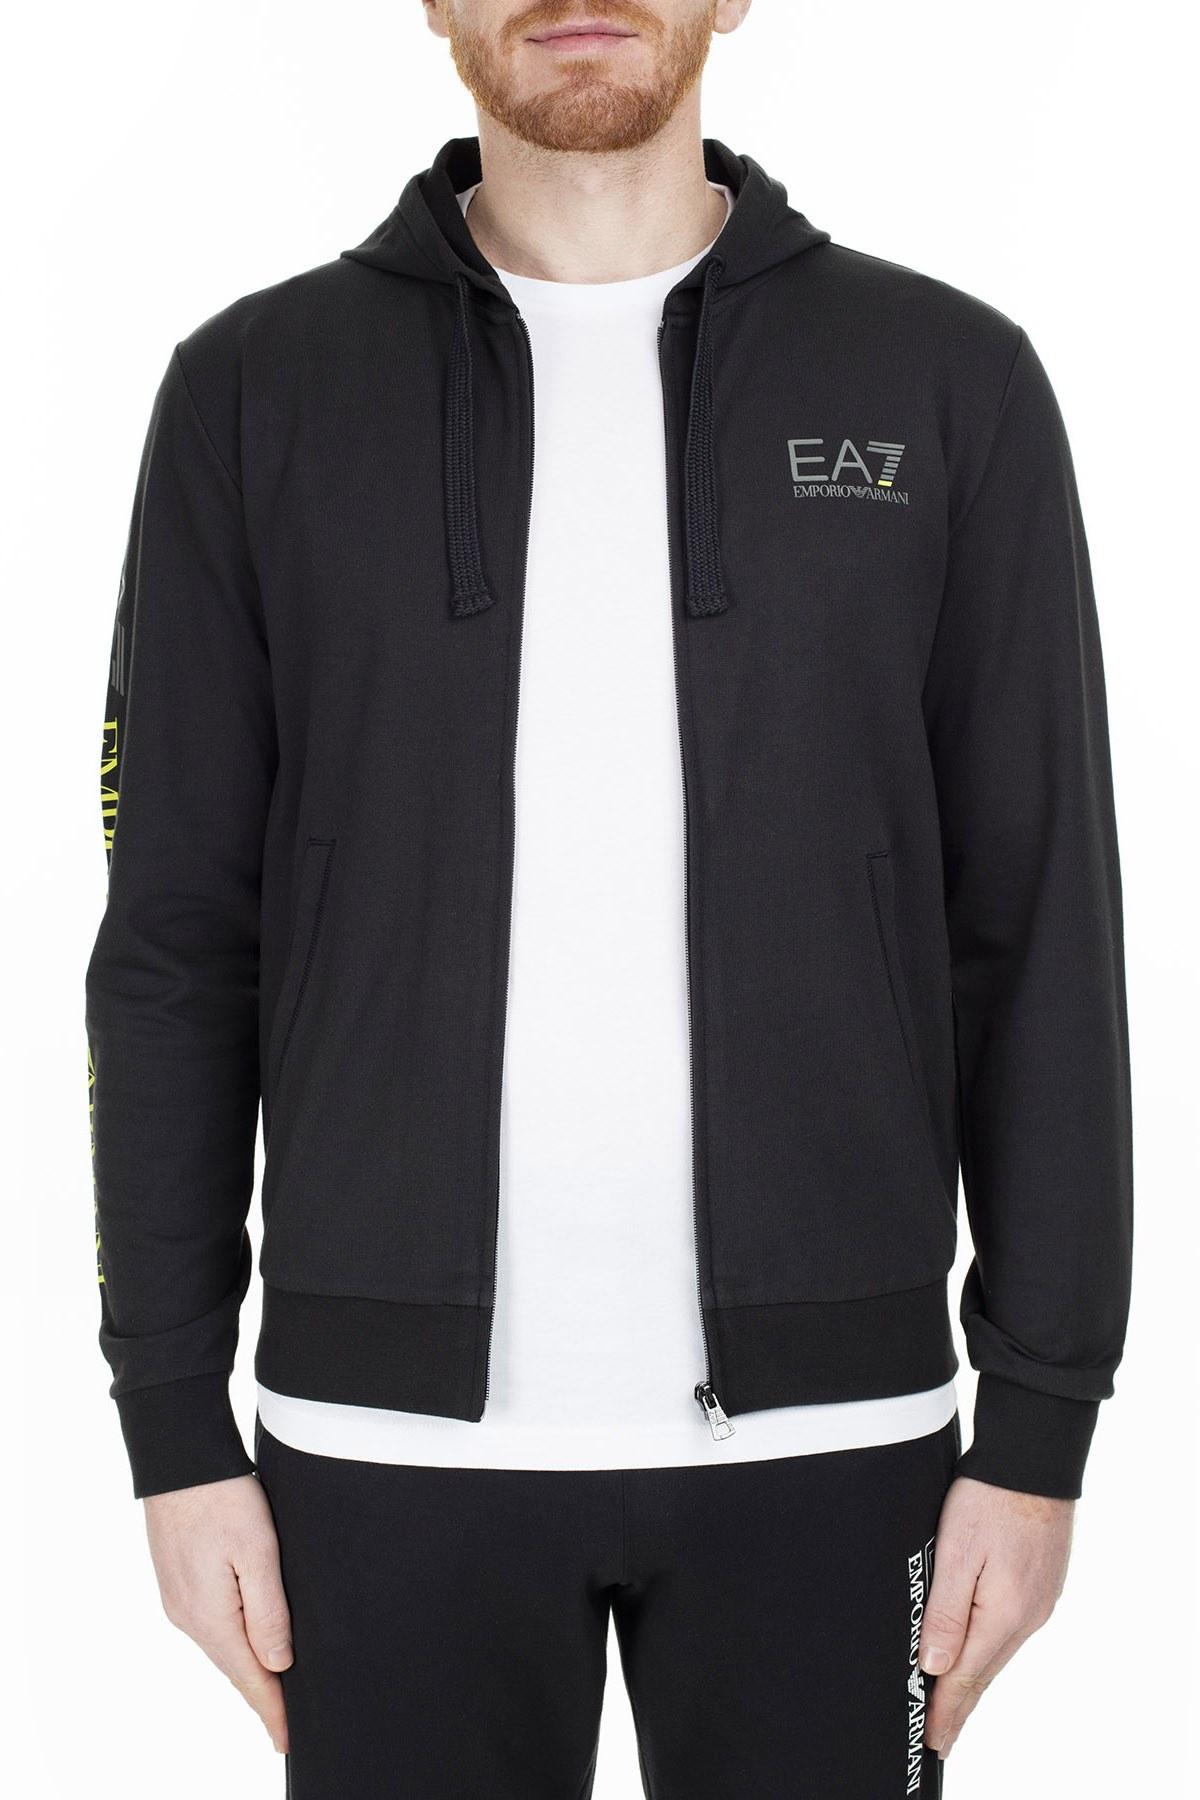 EA7 Erkek Sweat S 3GPM24 PJ05Z 1200 SİYAH